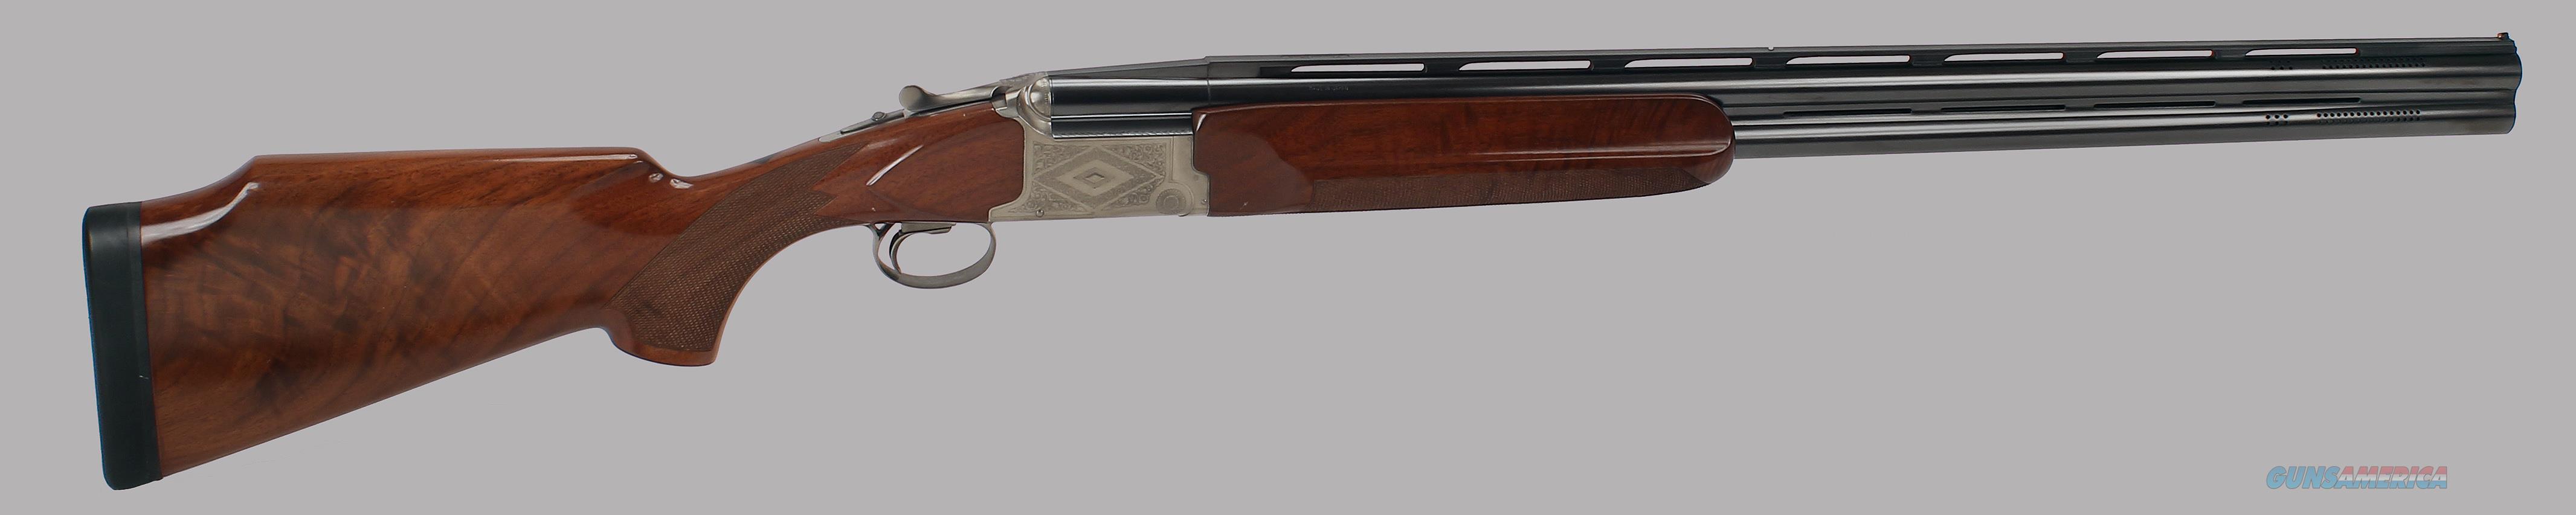 Winchester 101 Diamond Grade 12ga O/U & Single Barrel Shotgun  Guns > Shotguns > Winchester Shotguns - Modern > O/U > Trap/Skeet